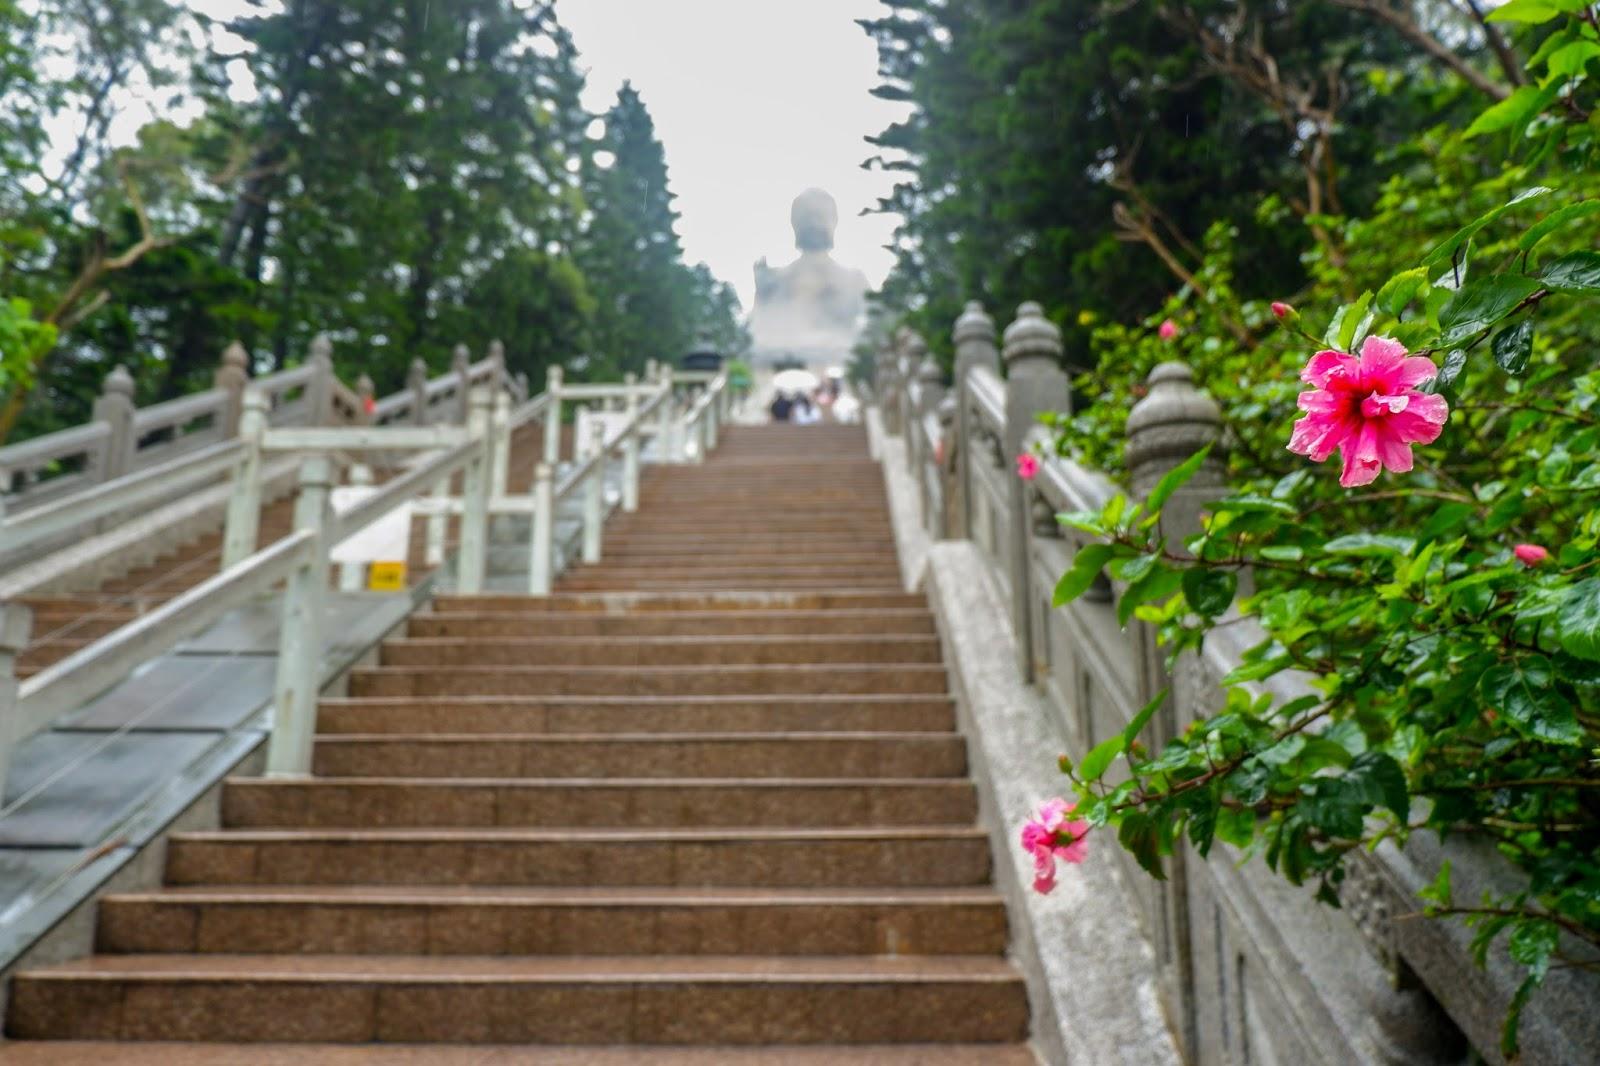 how to get to tai o from big buddha